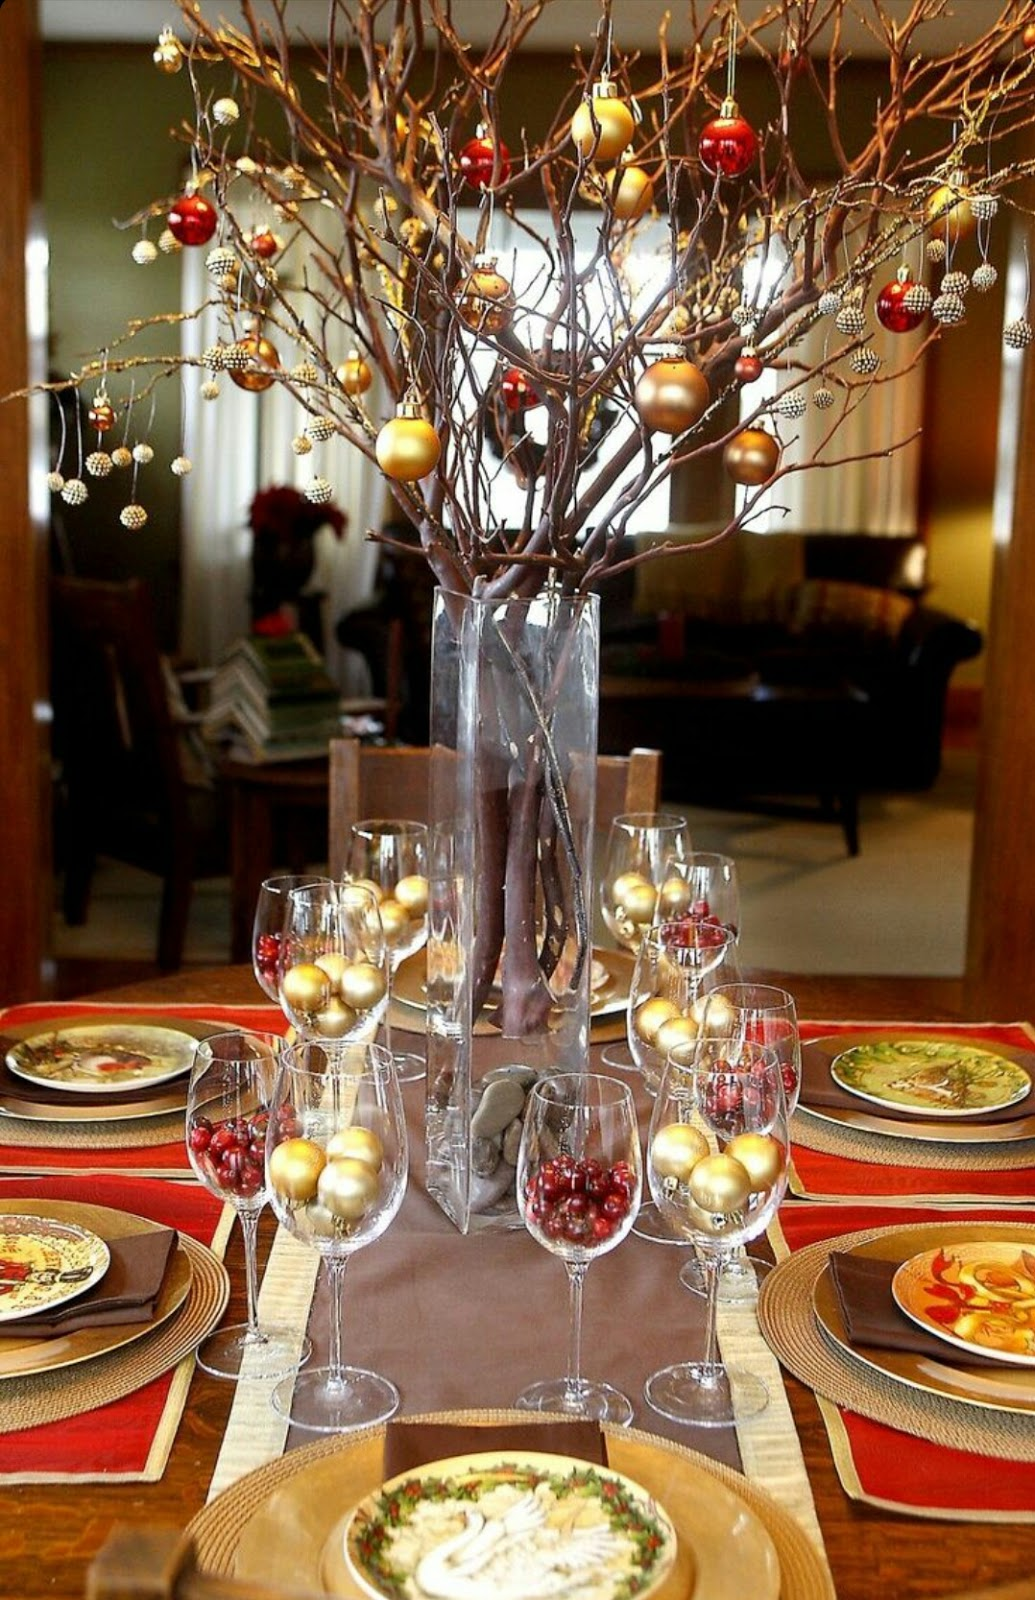 Diy christmas table decoration ideas - Simple And Urban Tabletop Christmas Tree